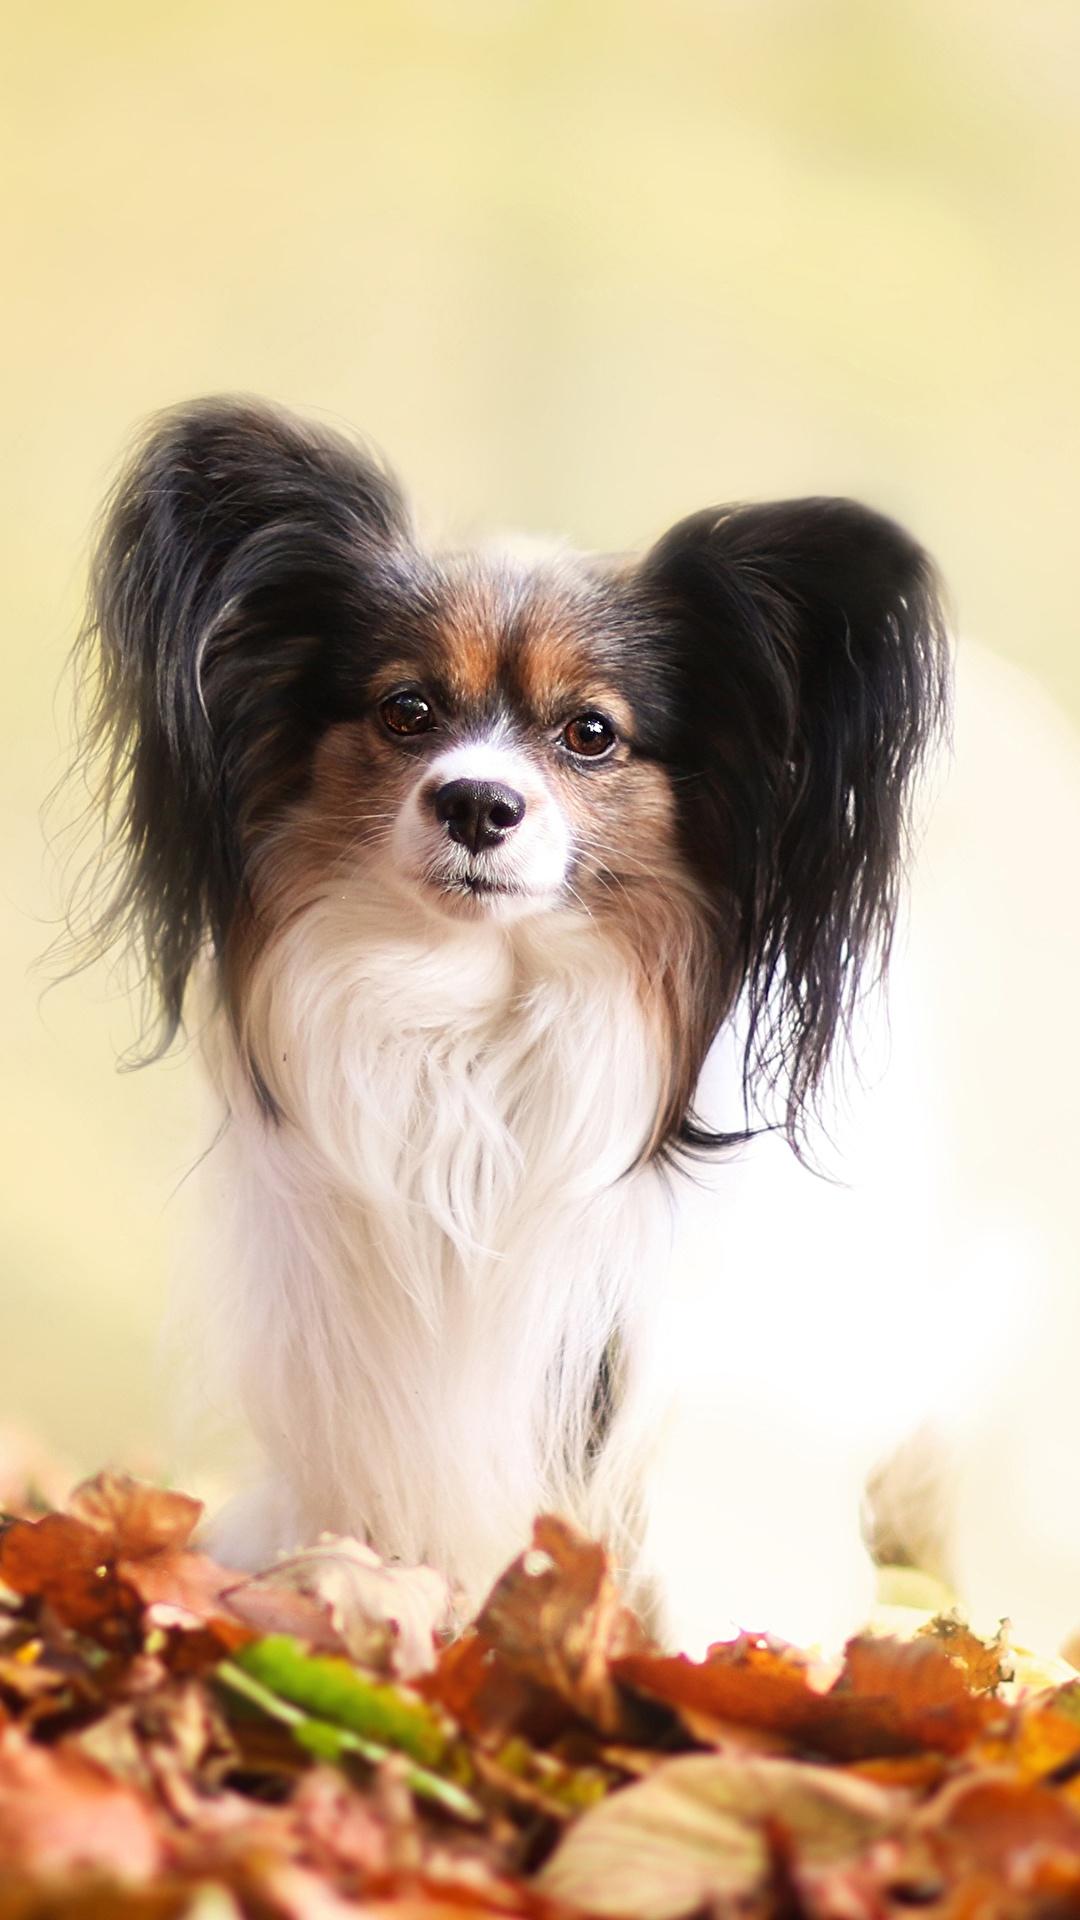 Sfondi del desktop Papillon cane Animali 1080x1920